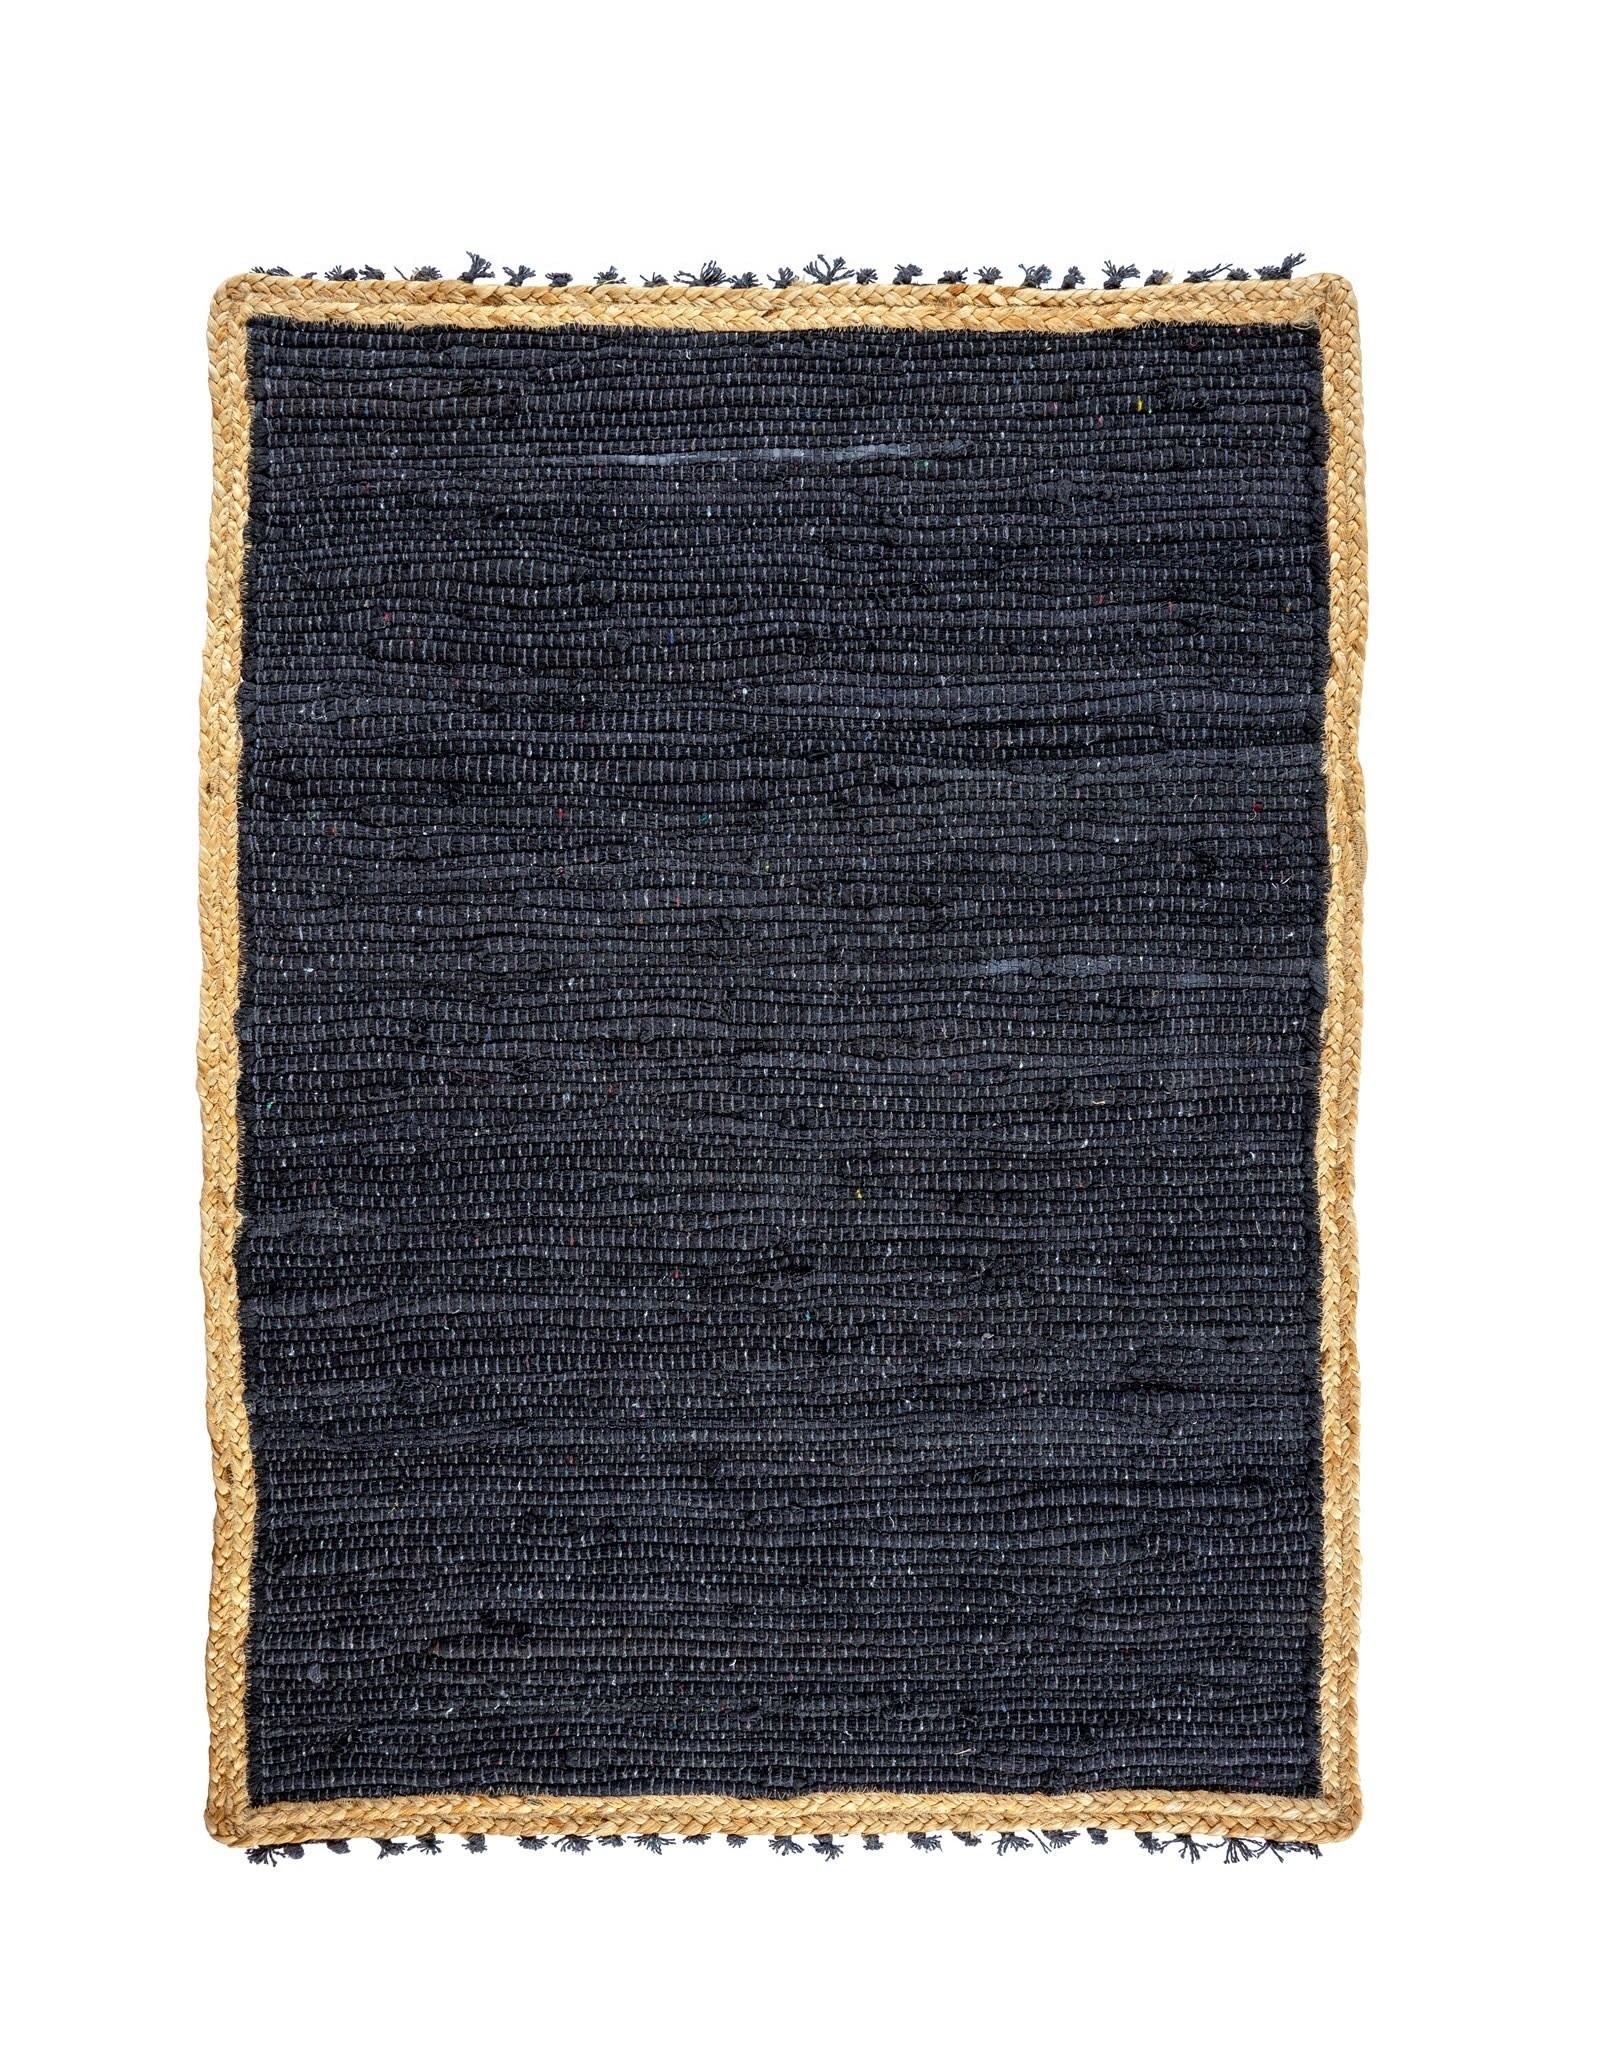 Indaba Atlas Braided Rug Small - Charcoal